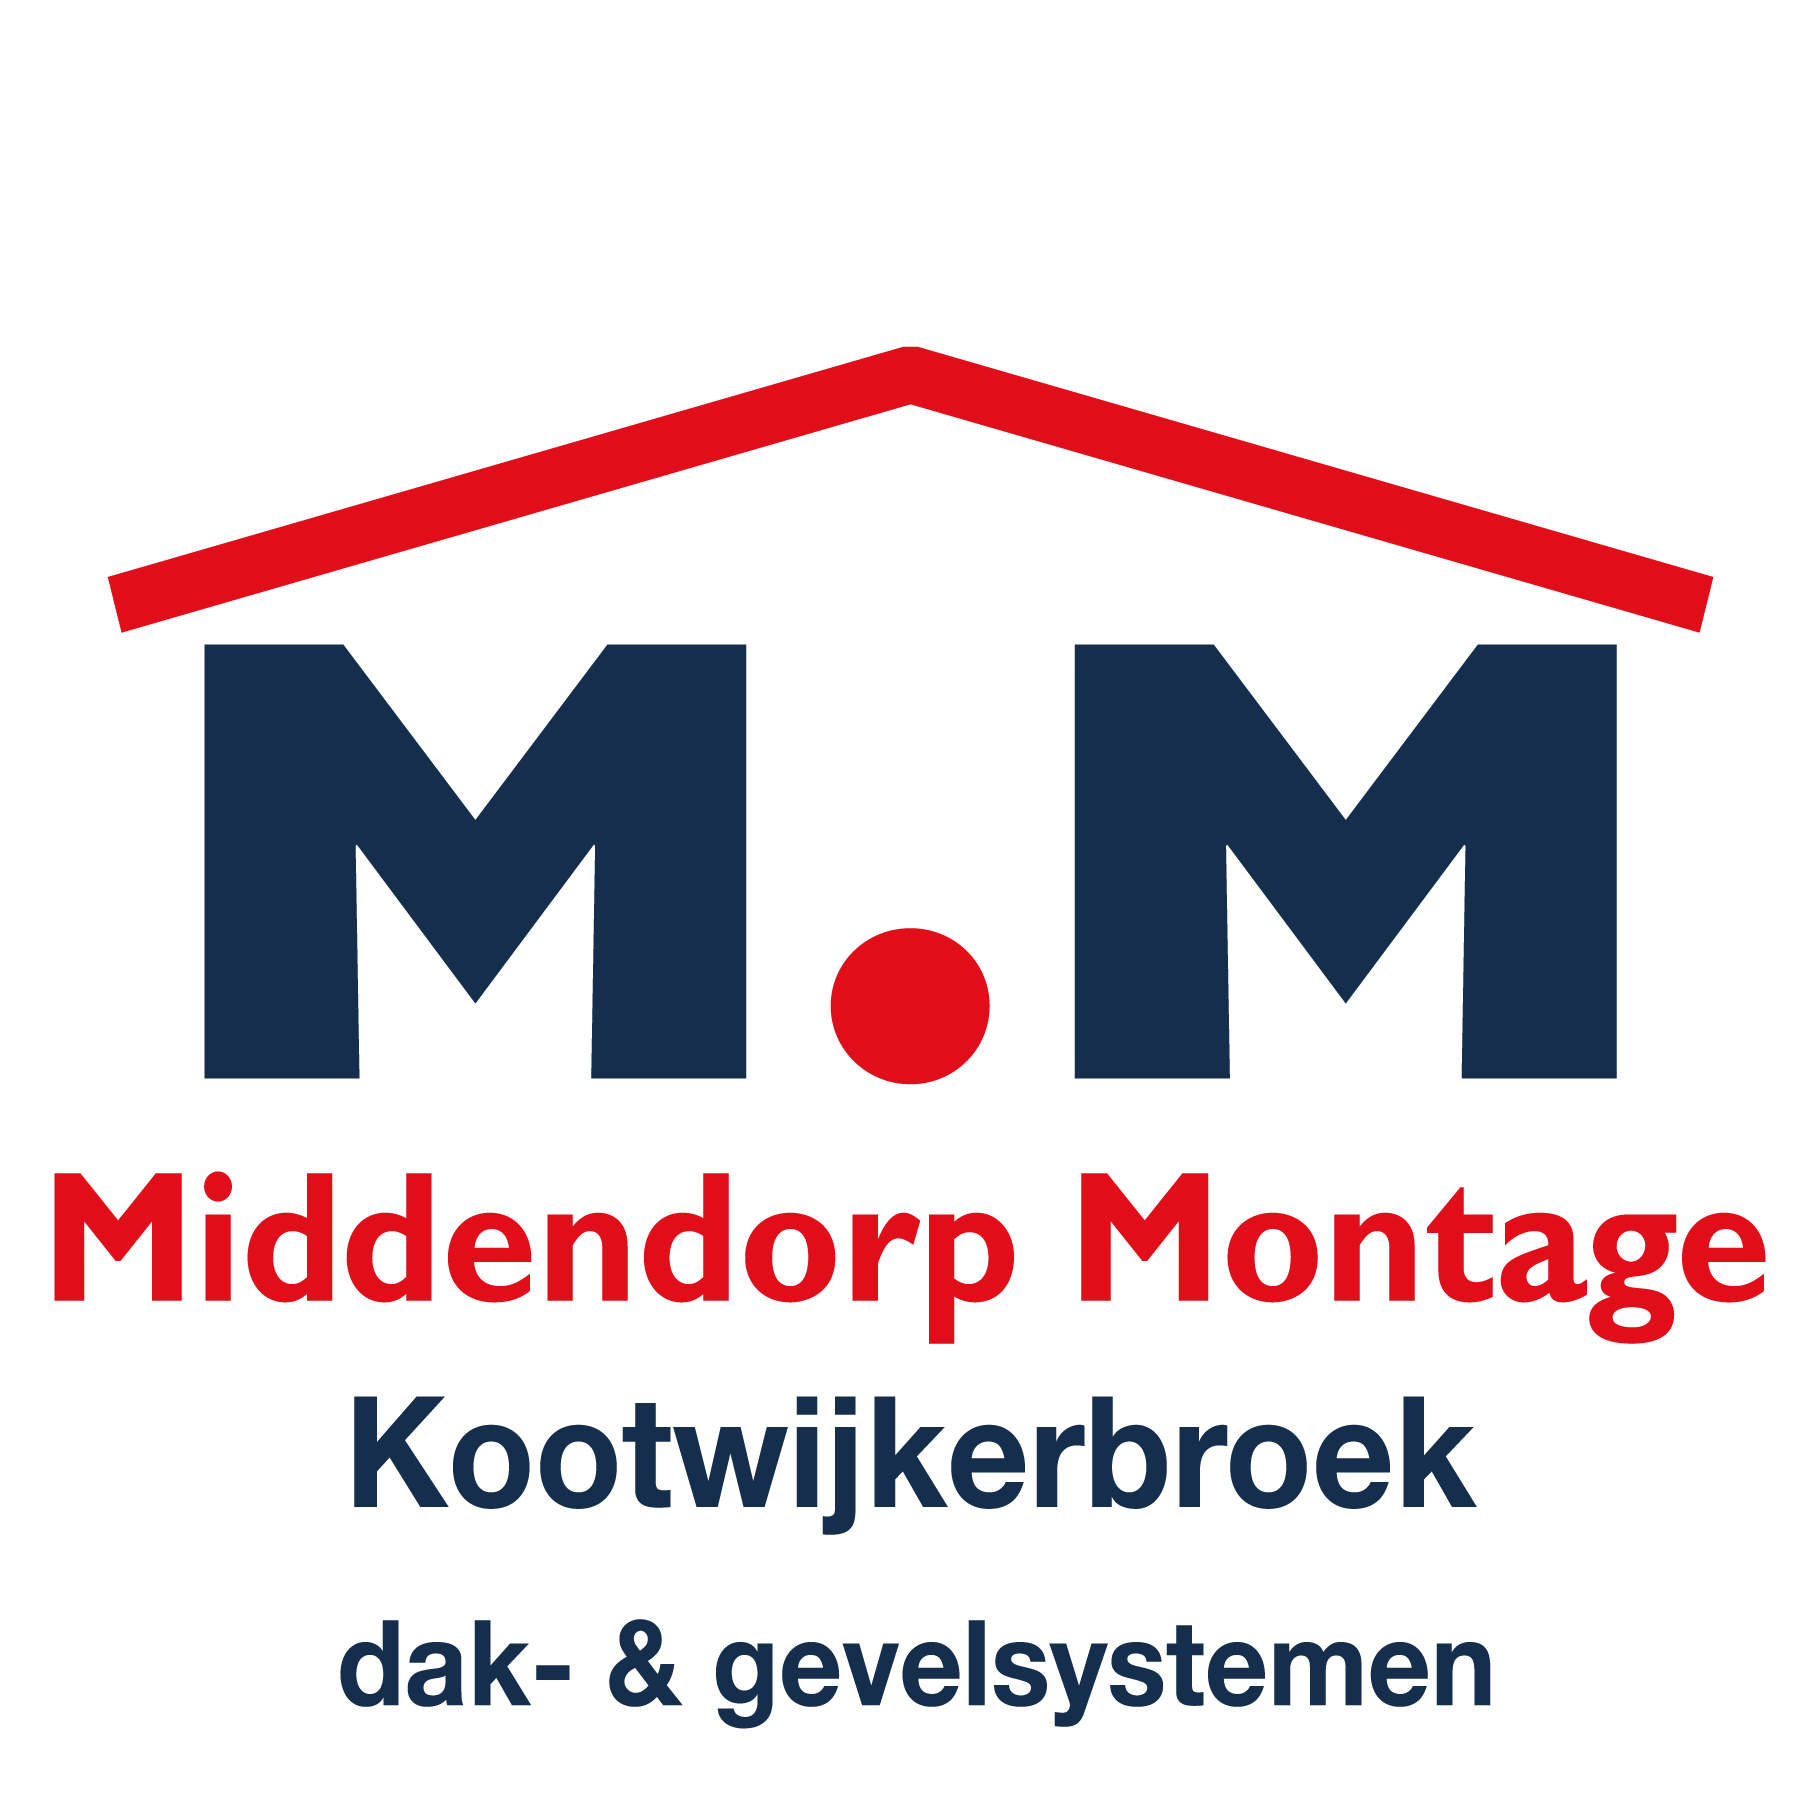 Middendorp Montage